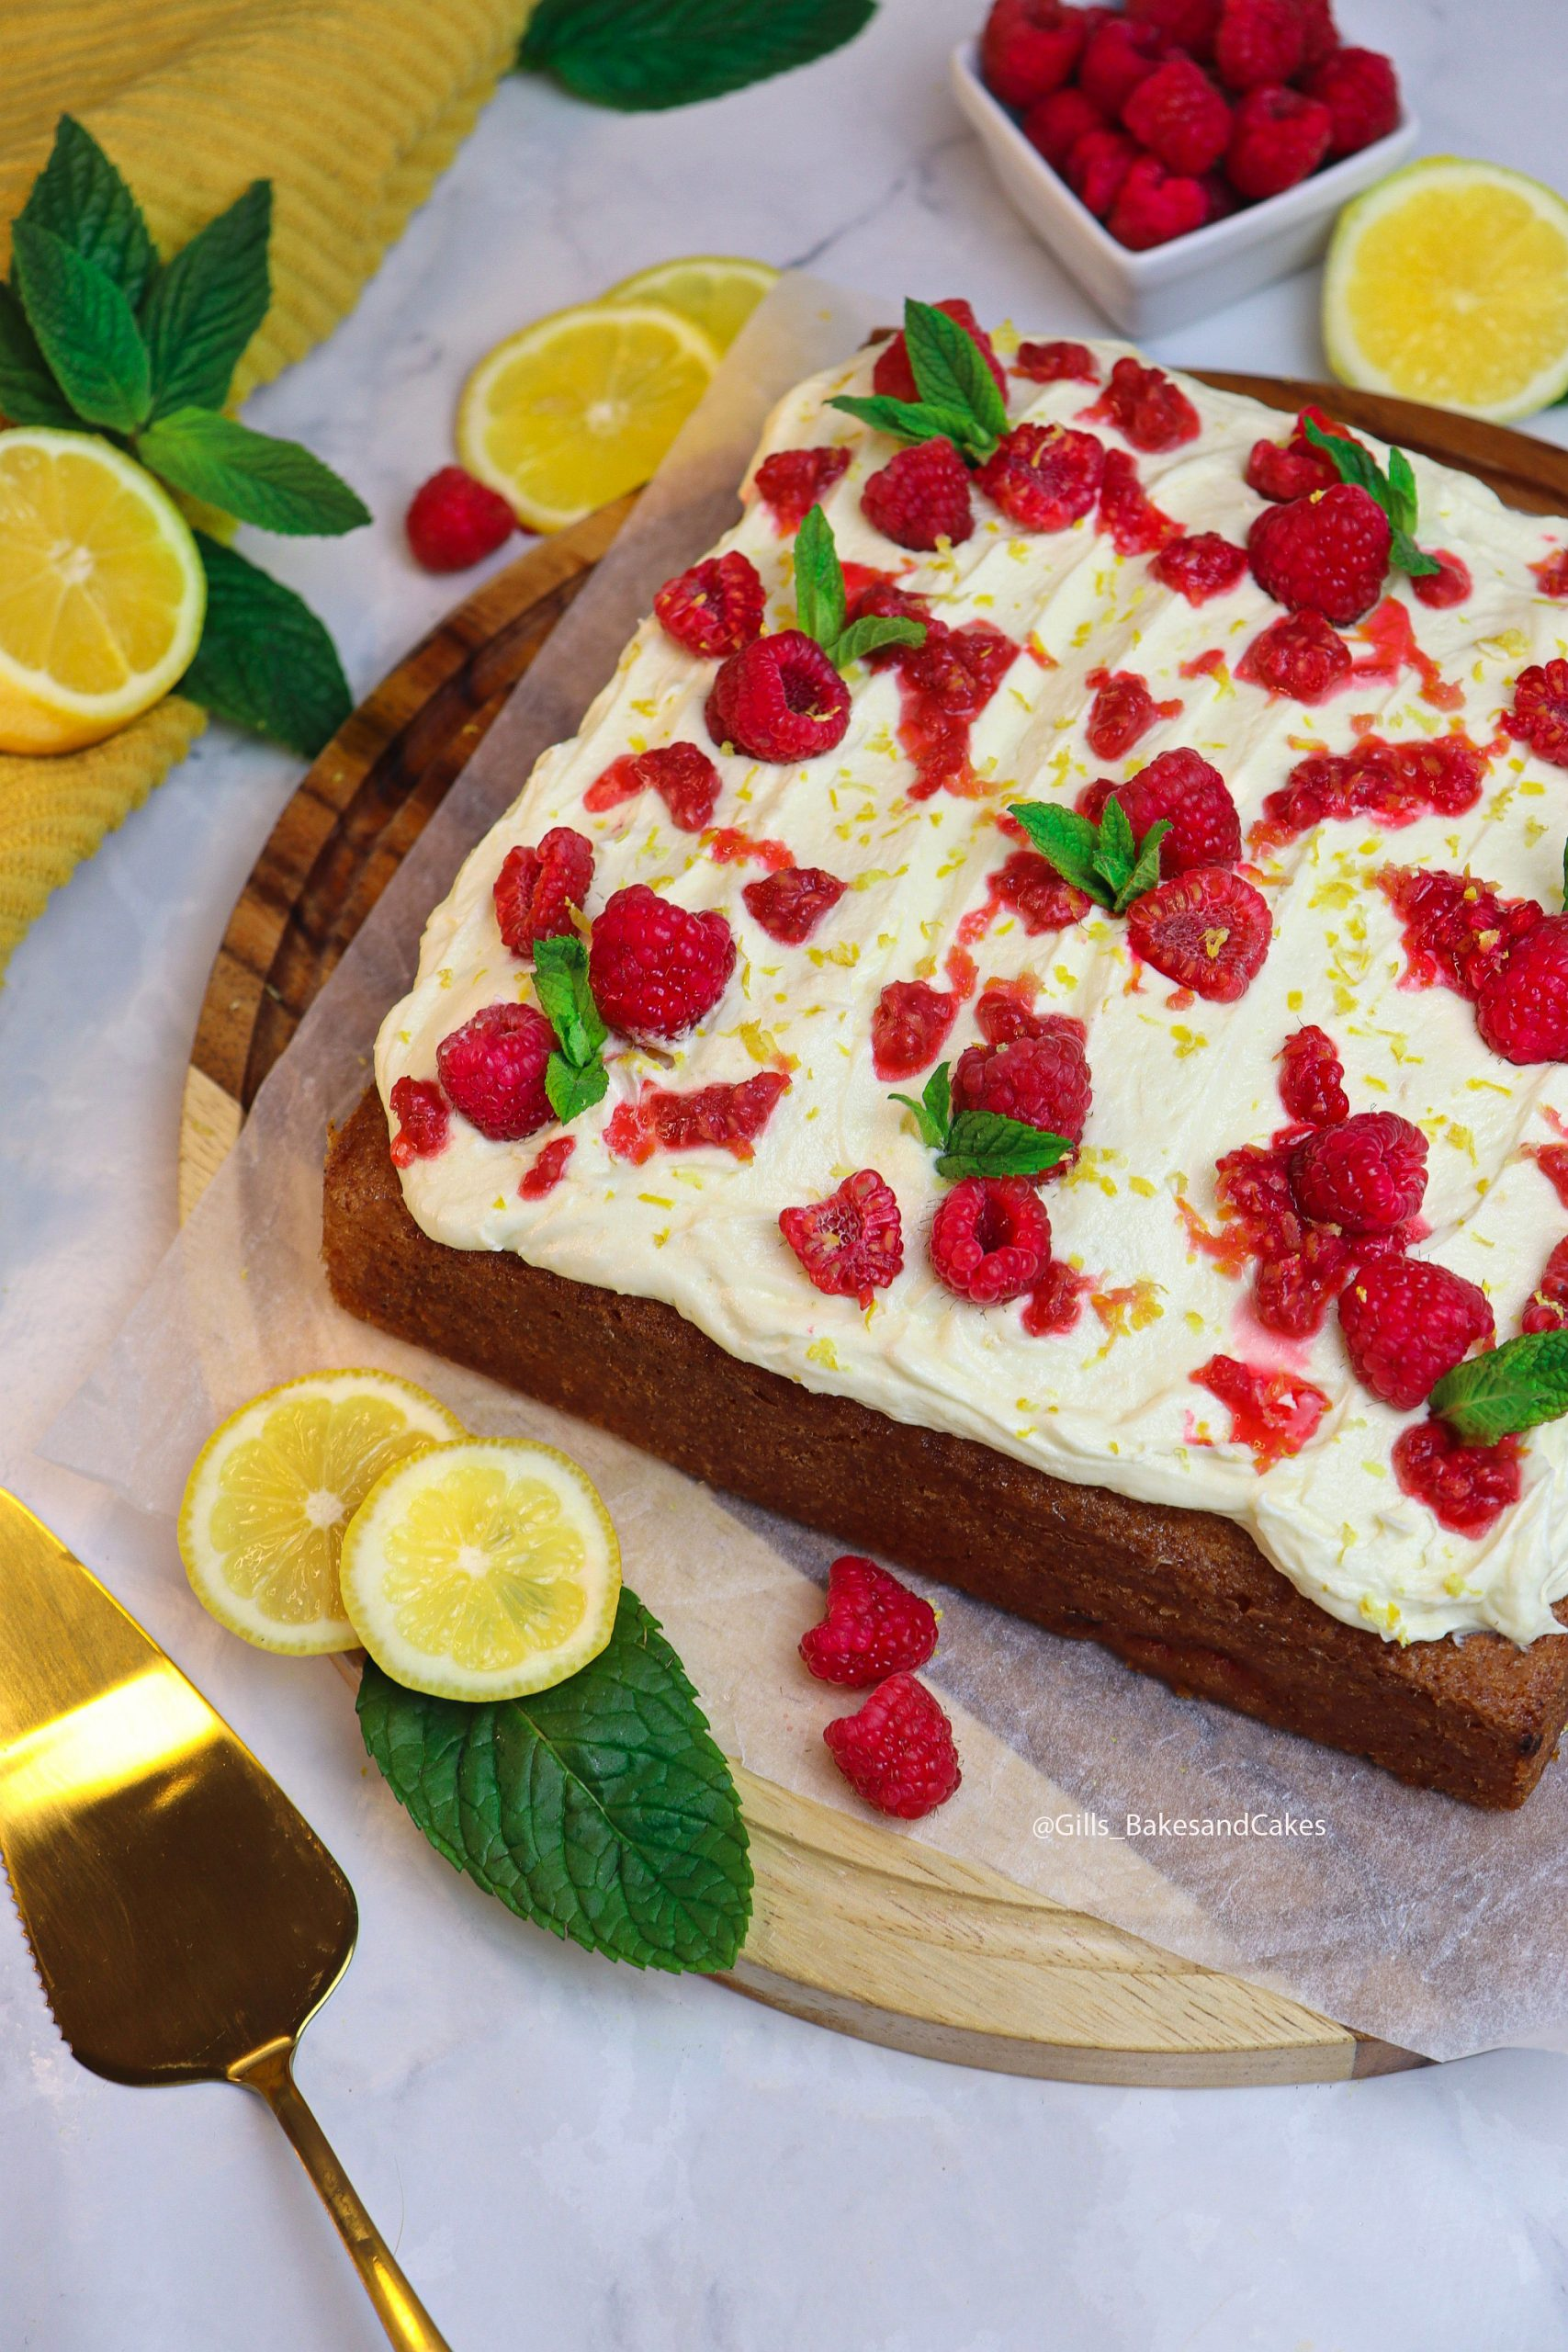 Lemon and Raspberry Traybake Cake